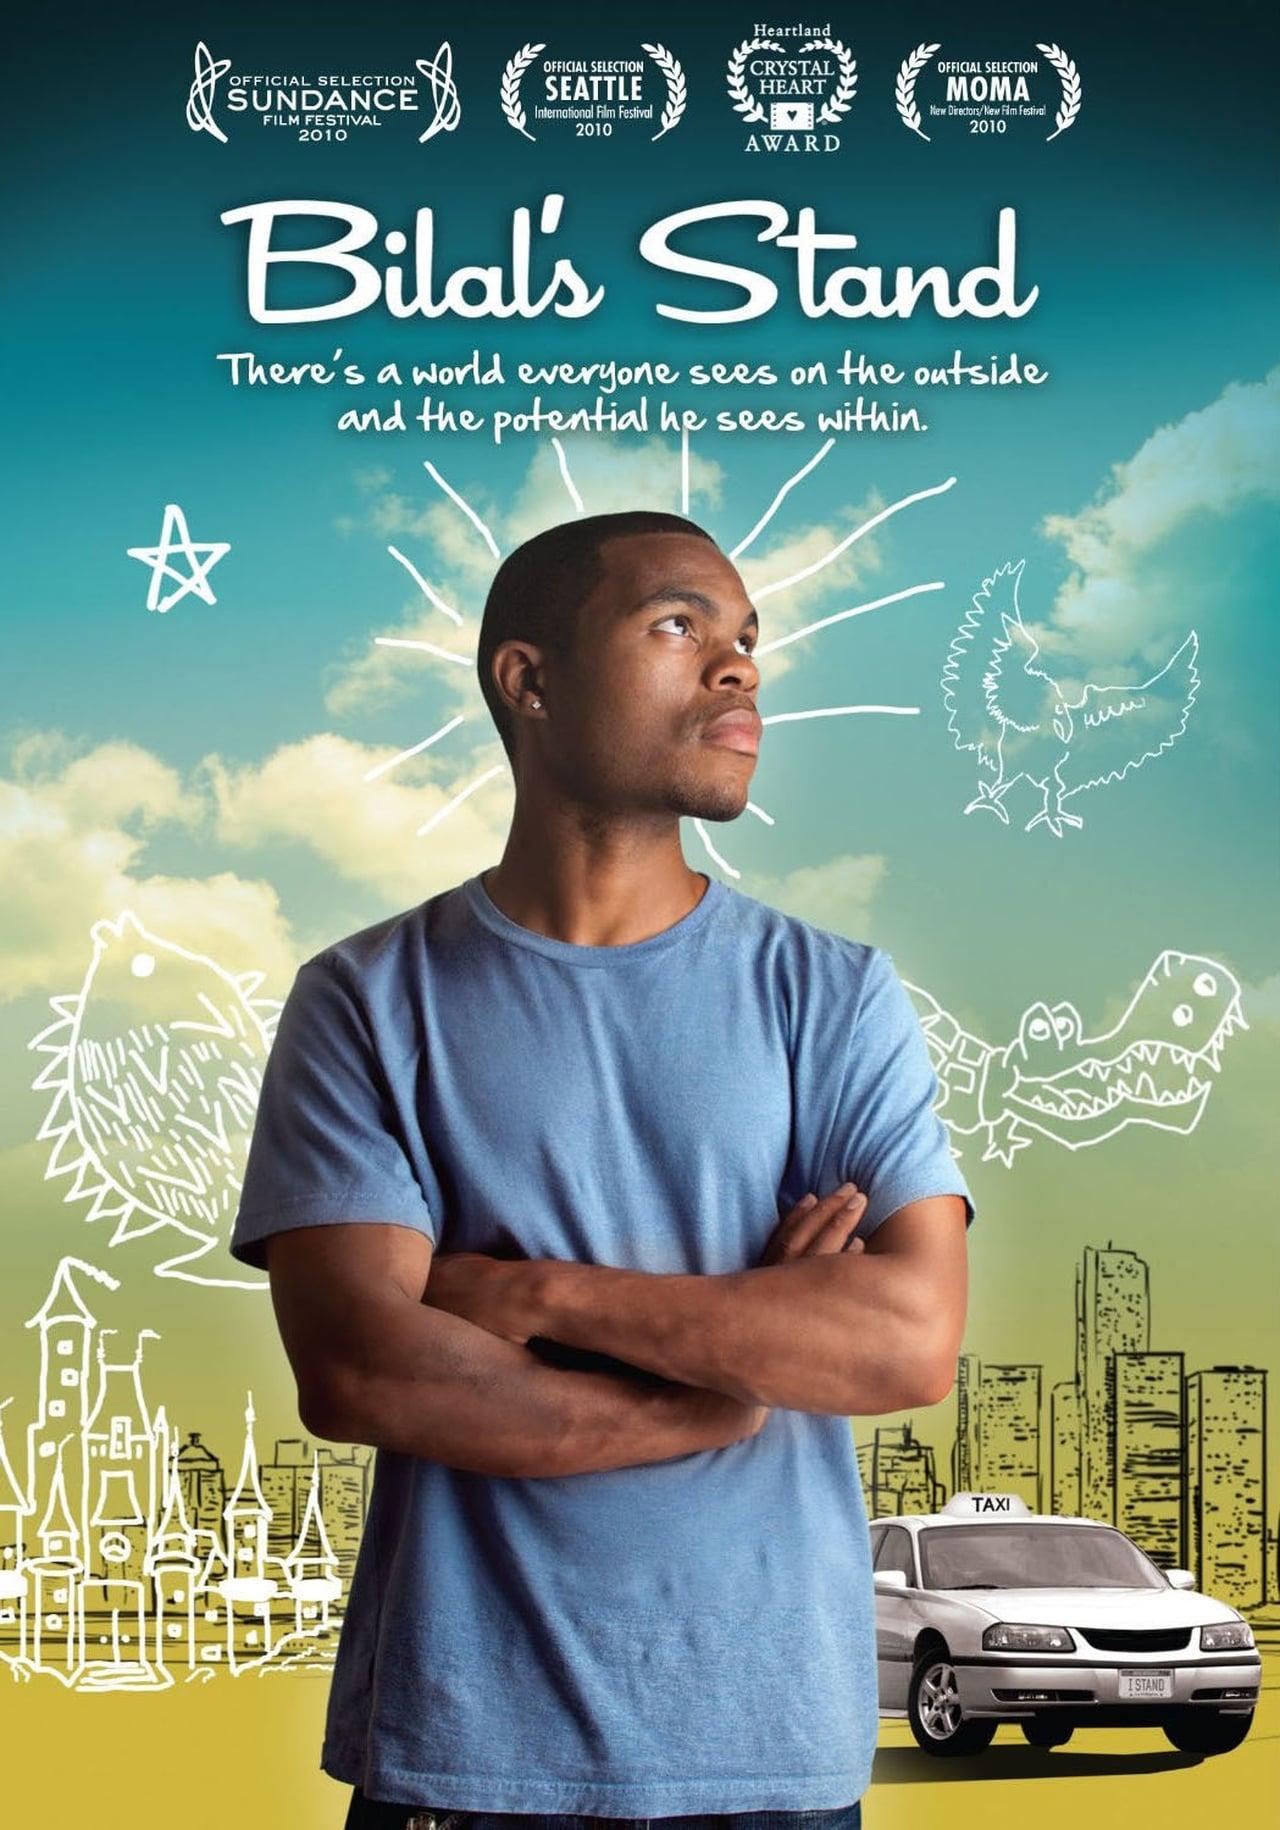 Bilal's Stand